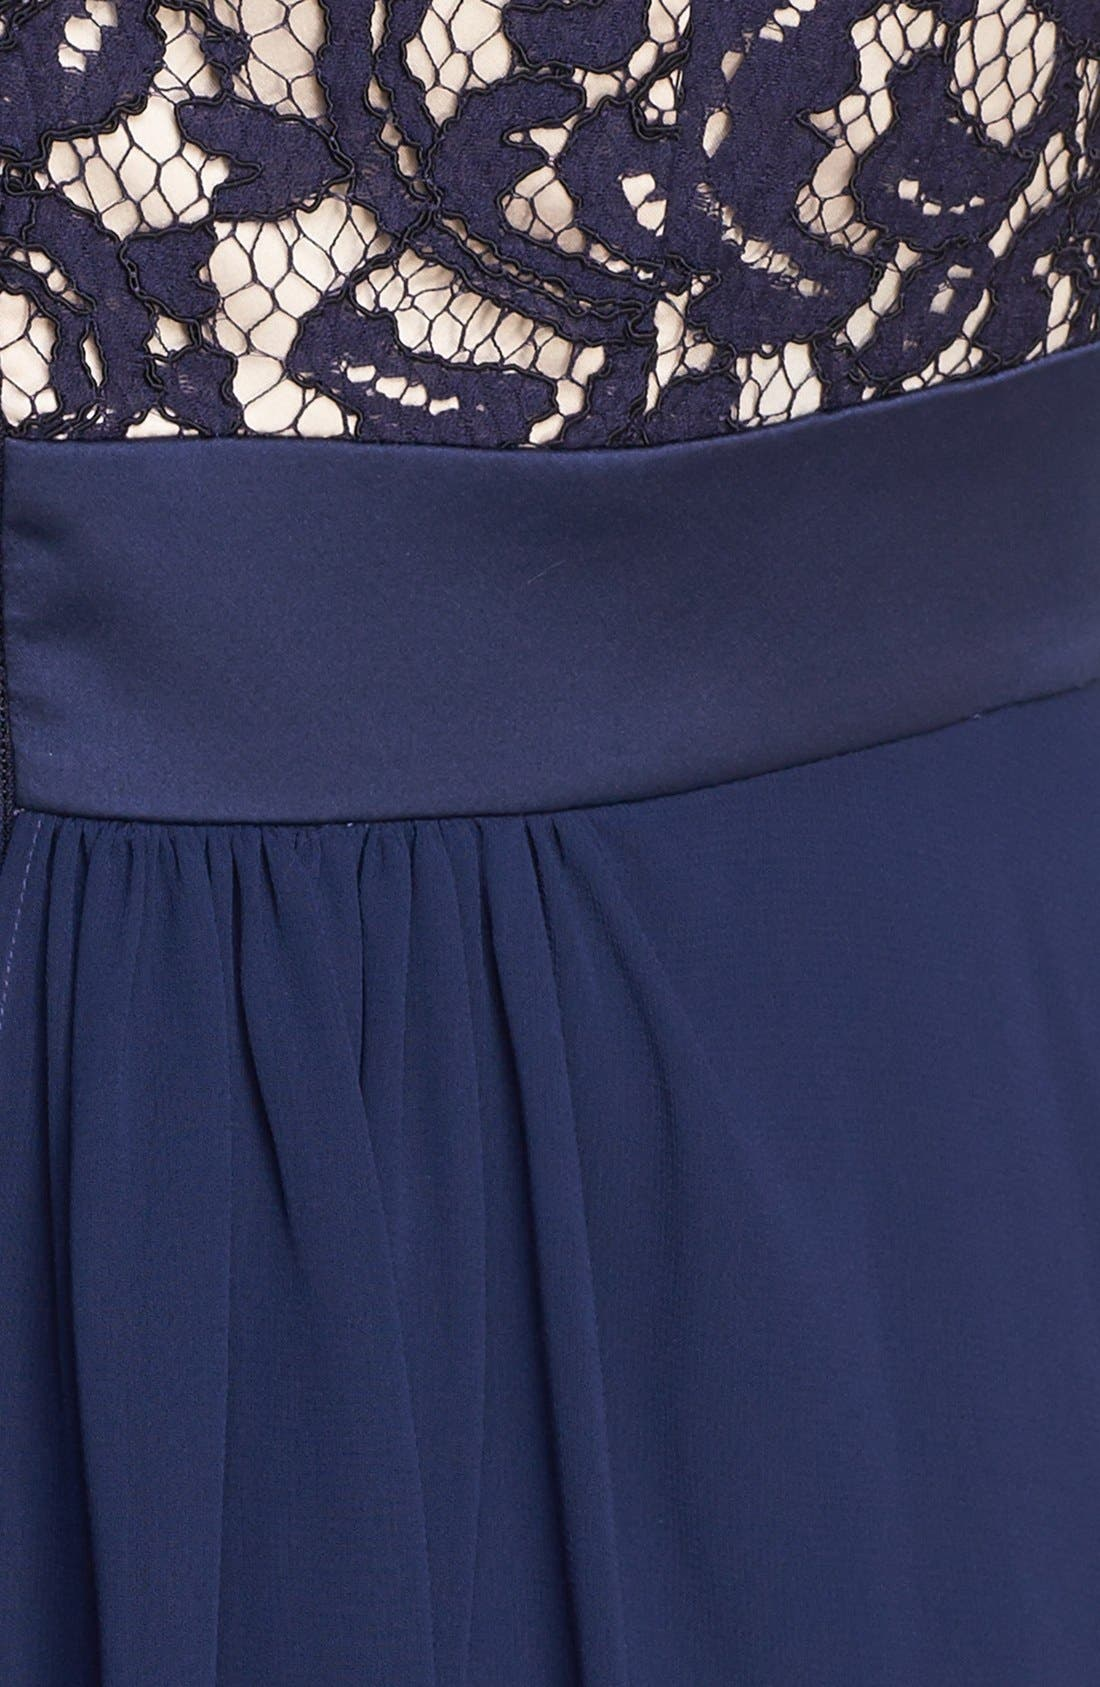 Alternate Image 3  - Eliza J Lace & Chiffon Gown